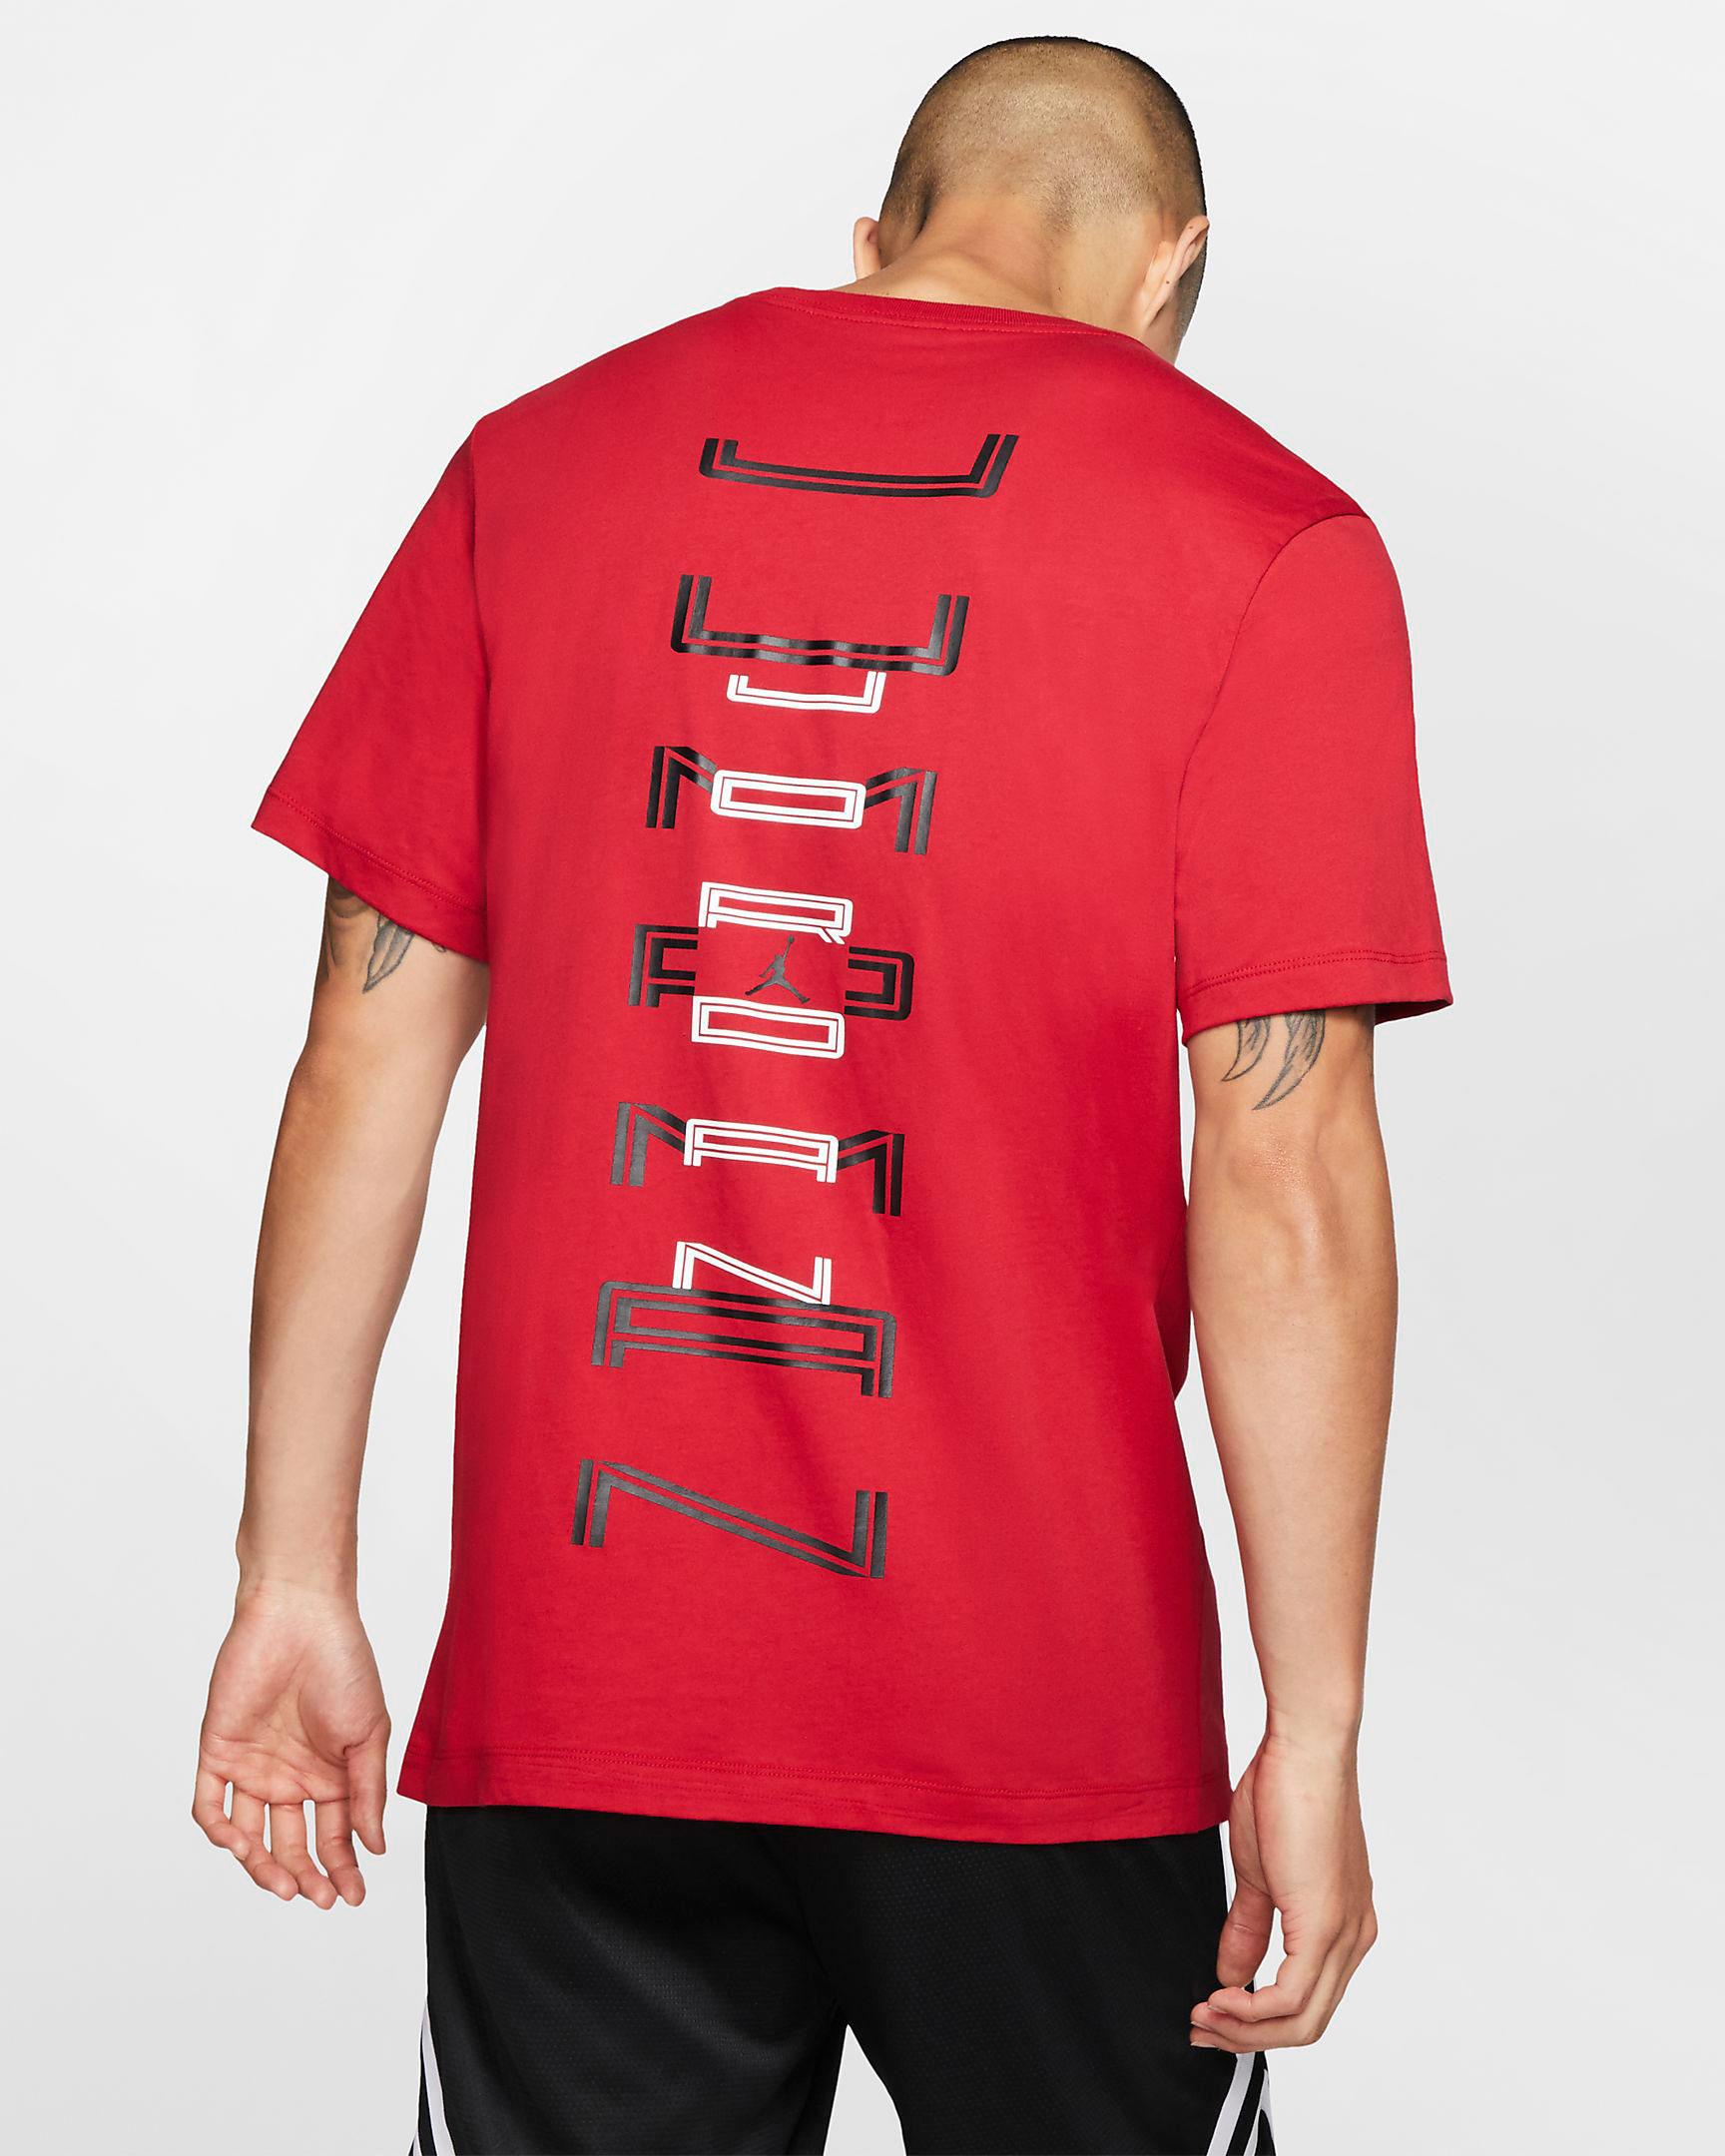 air-jordan-11-bred-sneaker-tee-shirt-2